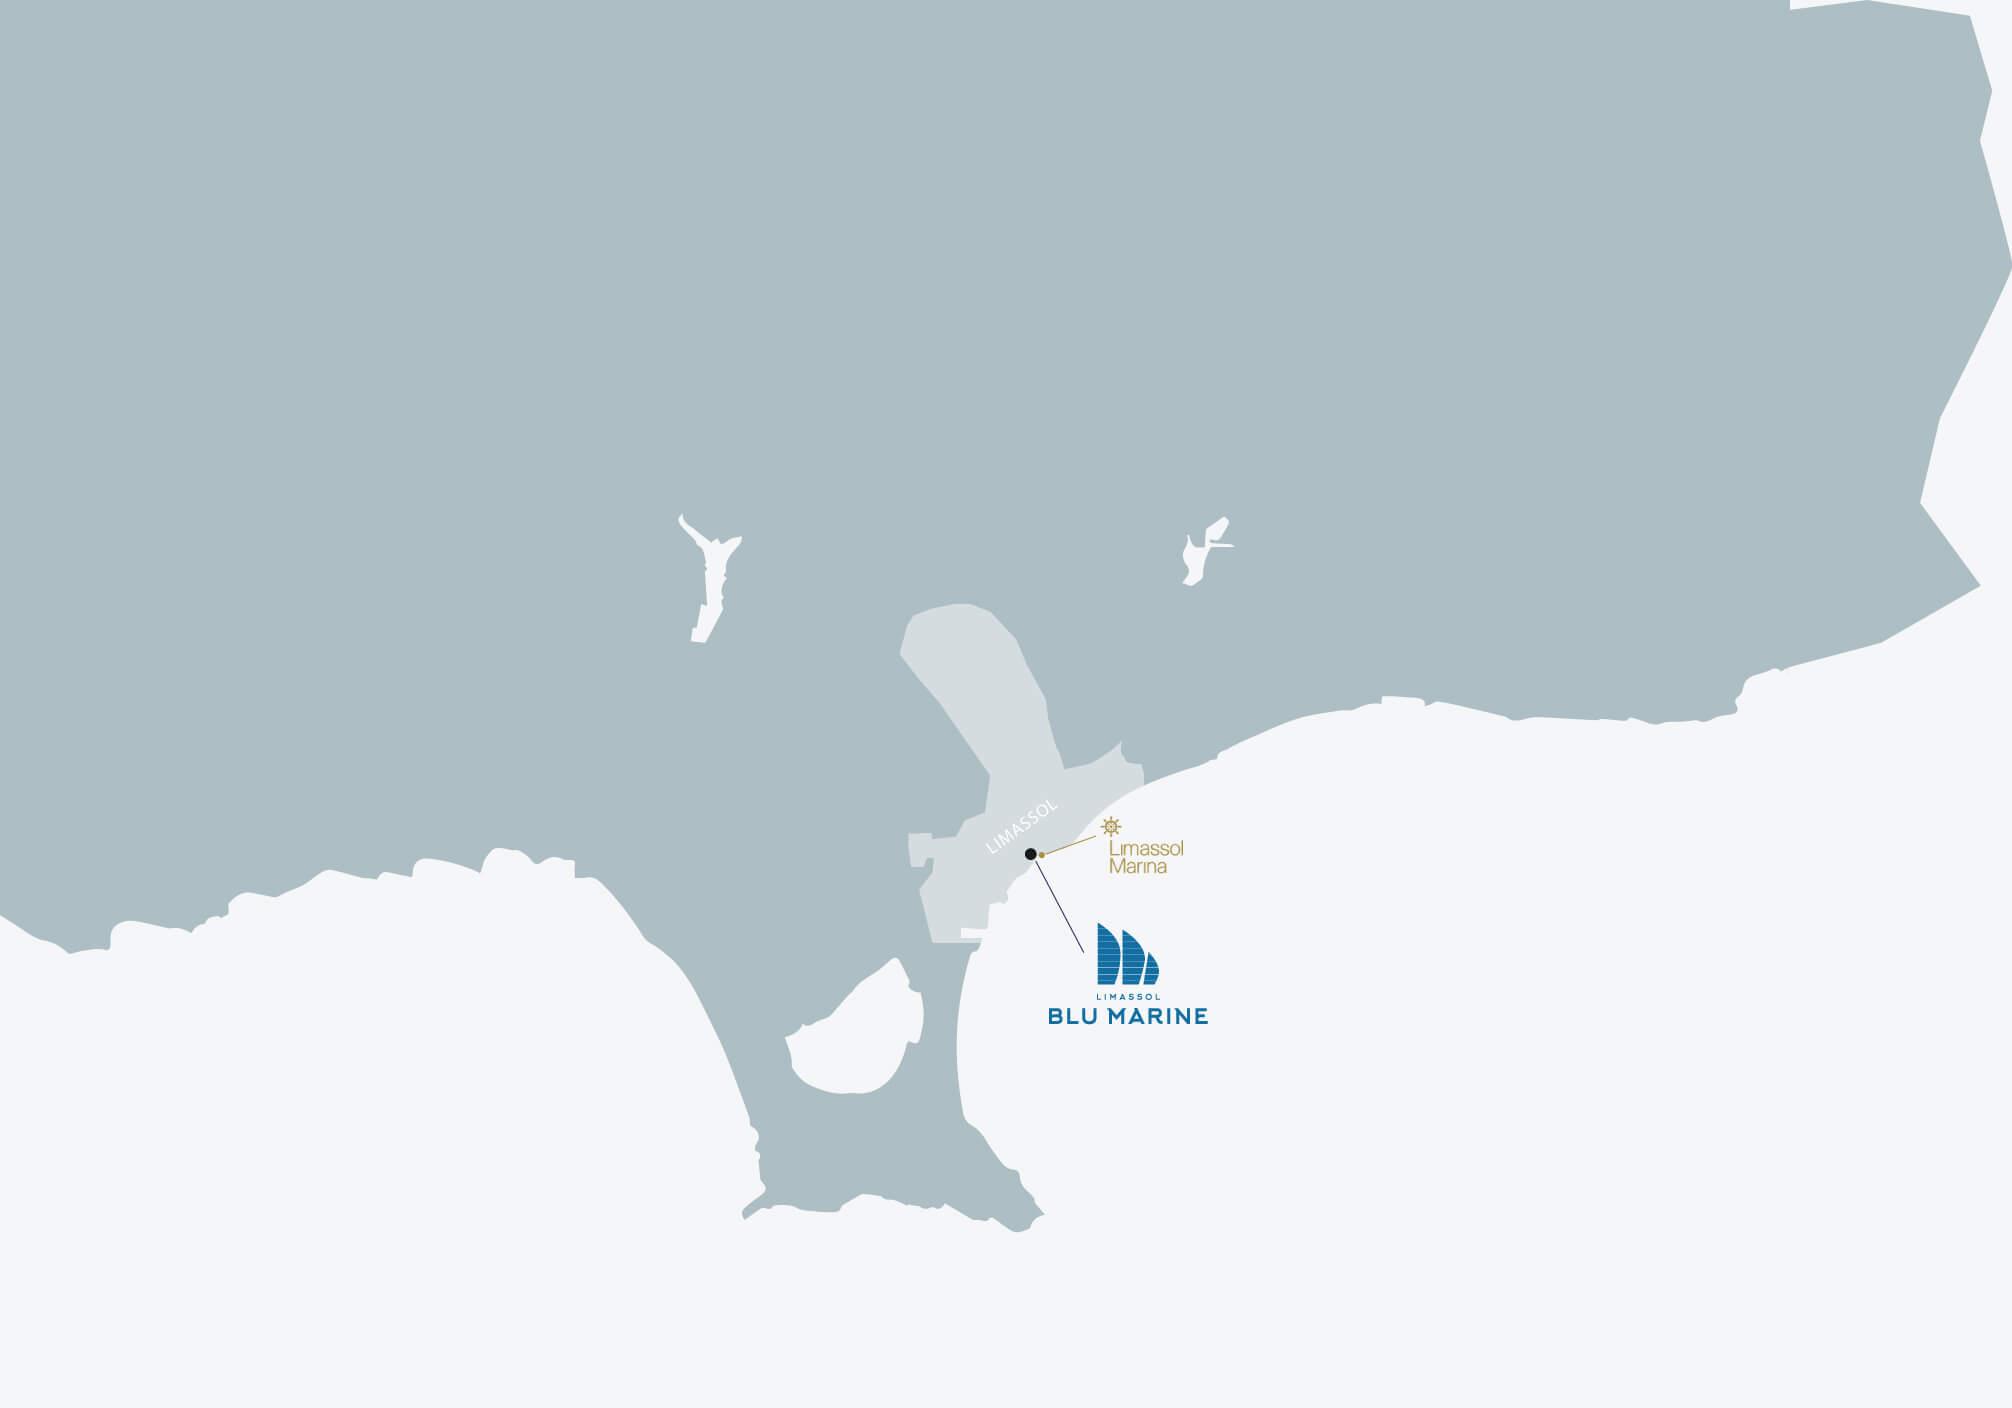 map limassol cyprus